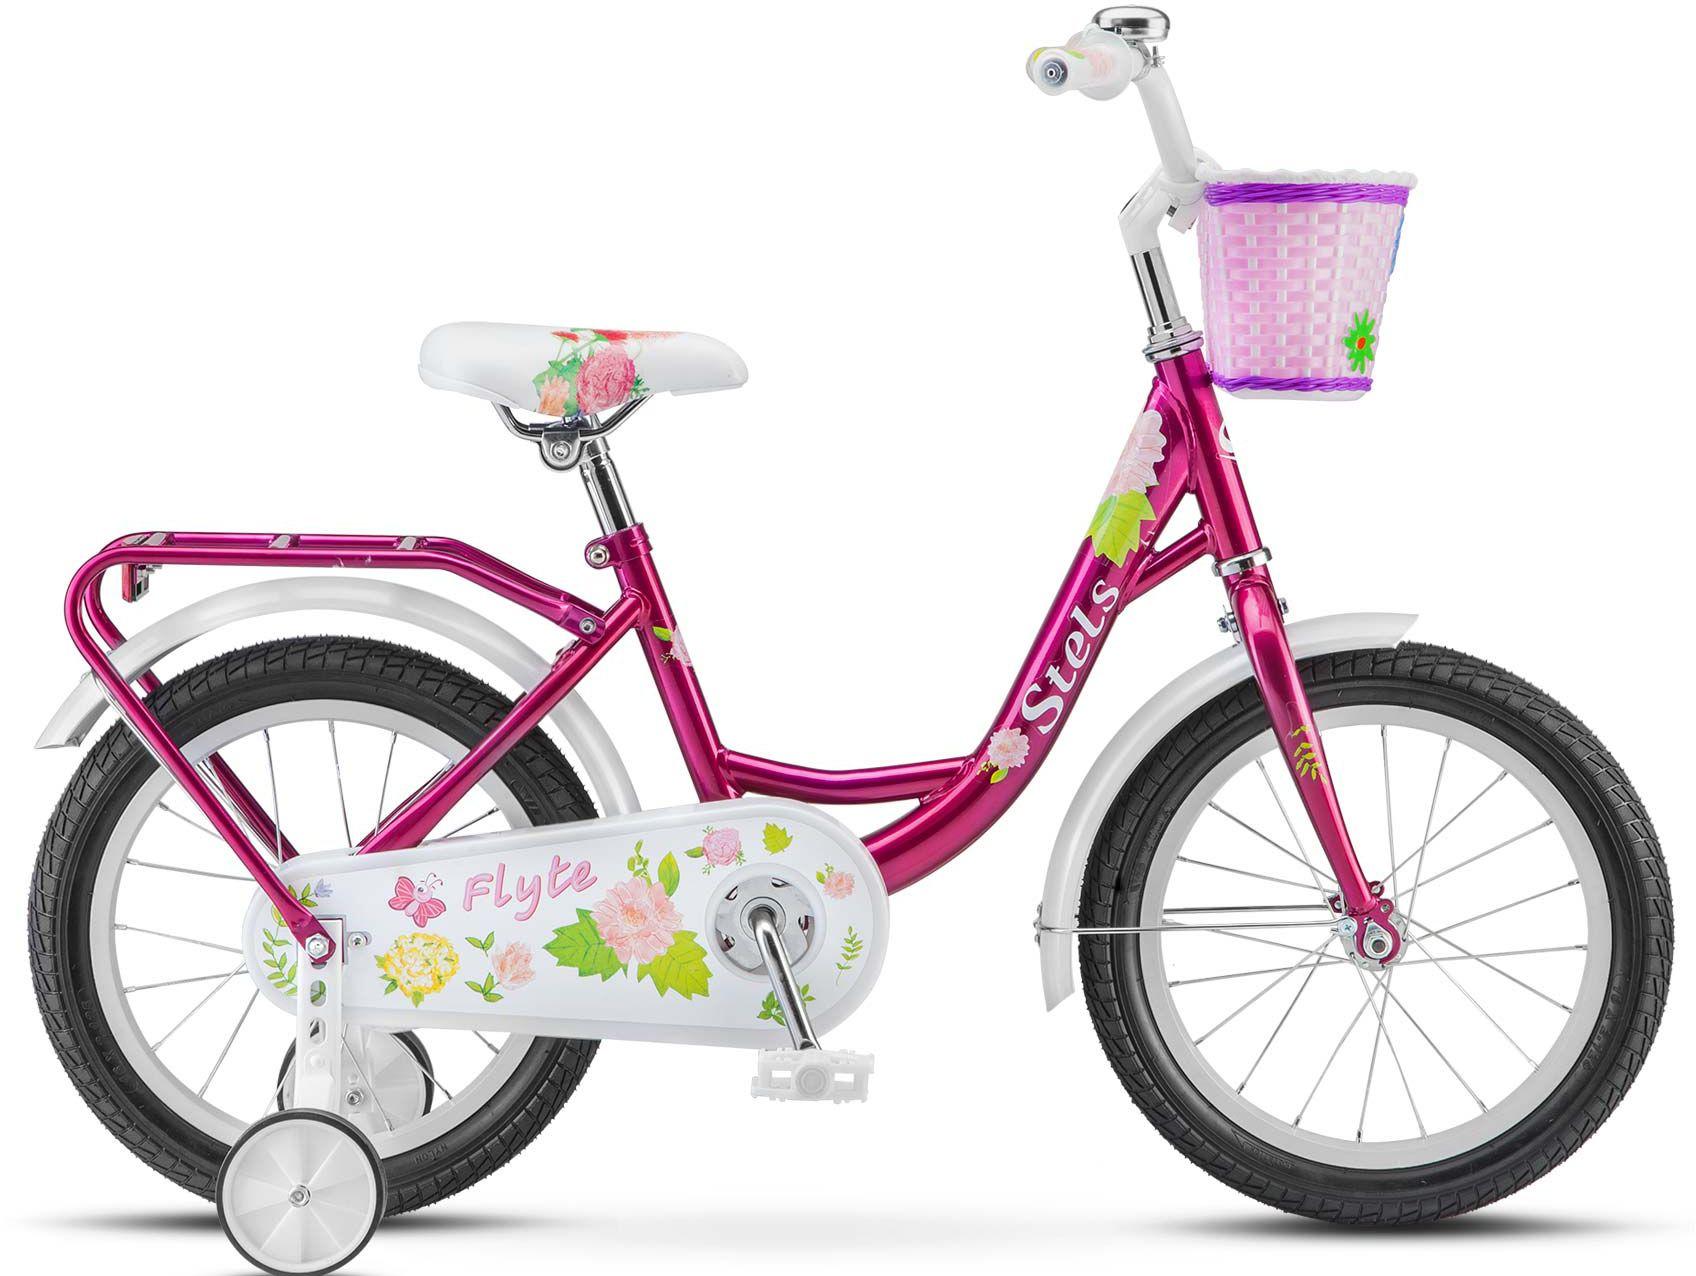 Велосипед Stels Flyte 16 2017,  Детские  - артикул:278672